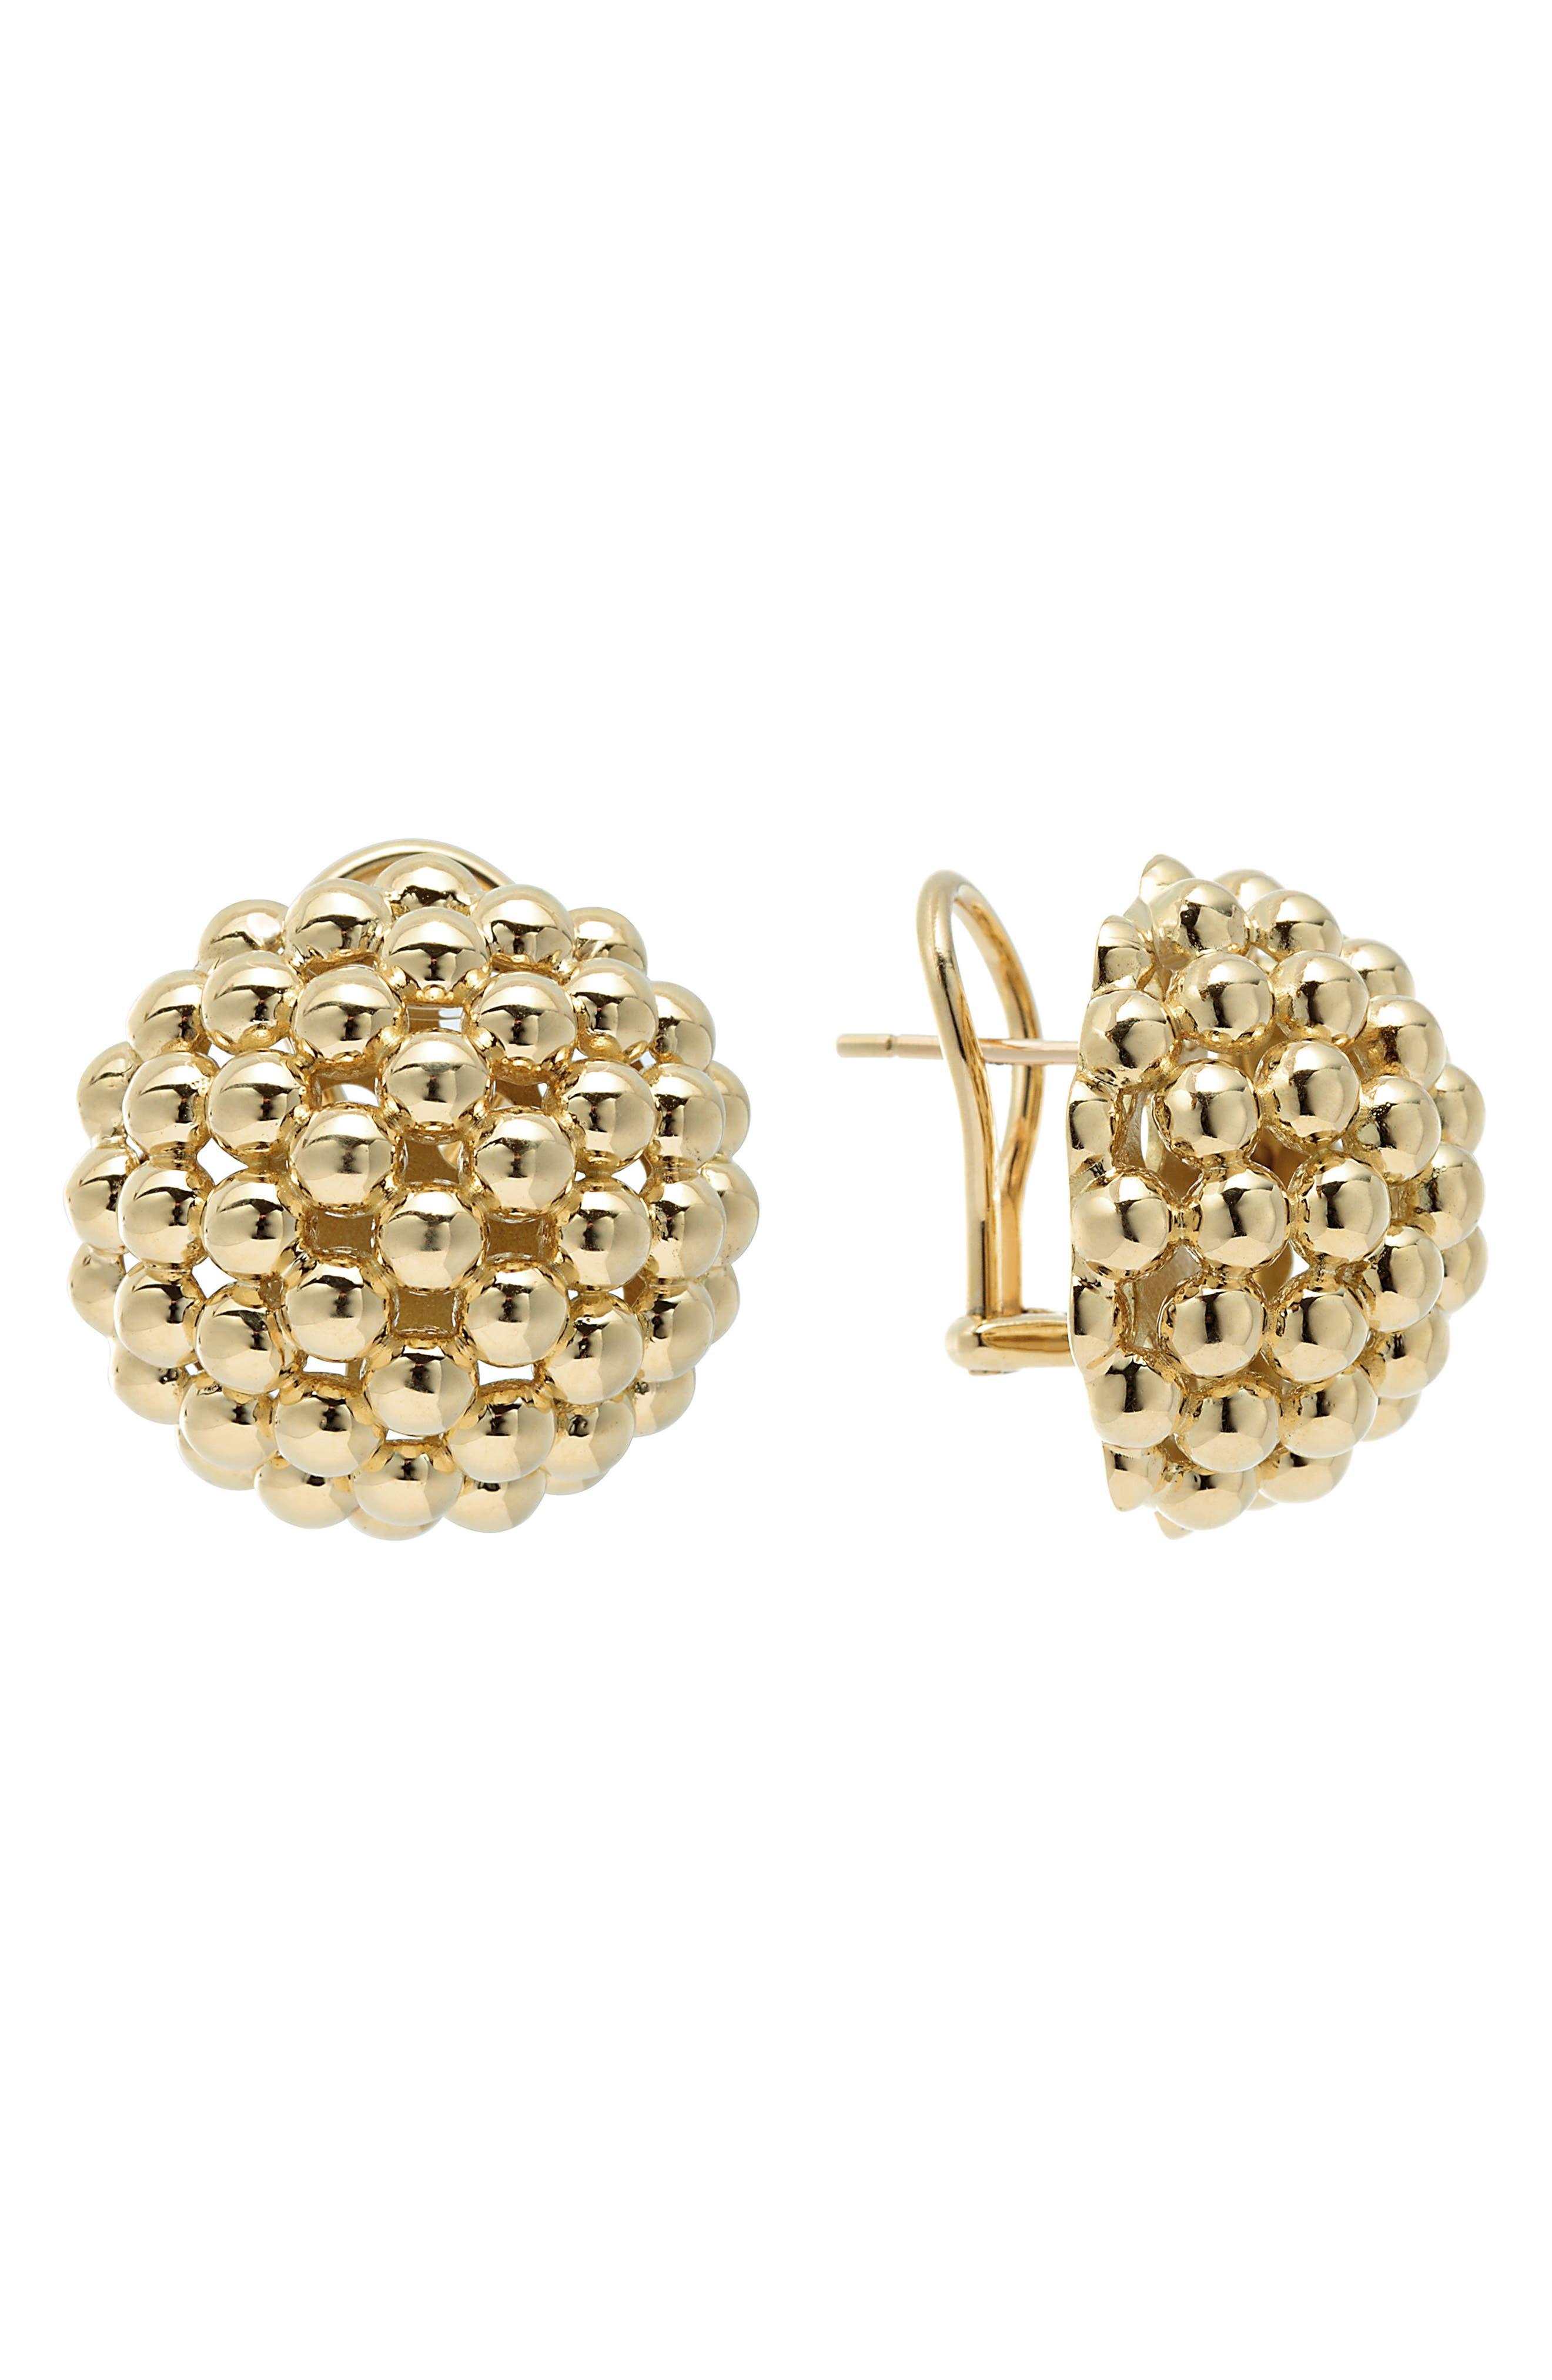 Caviar Gold Dome Omega Earrings,                             Main thumbnail 1, color,                             Gold